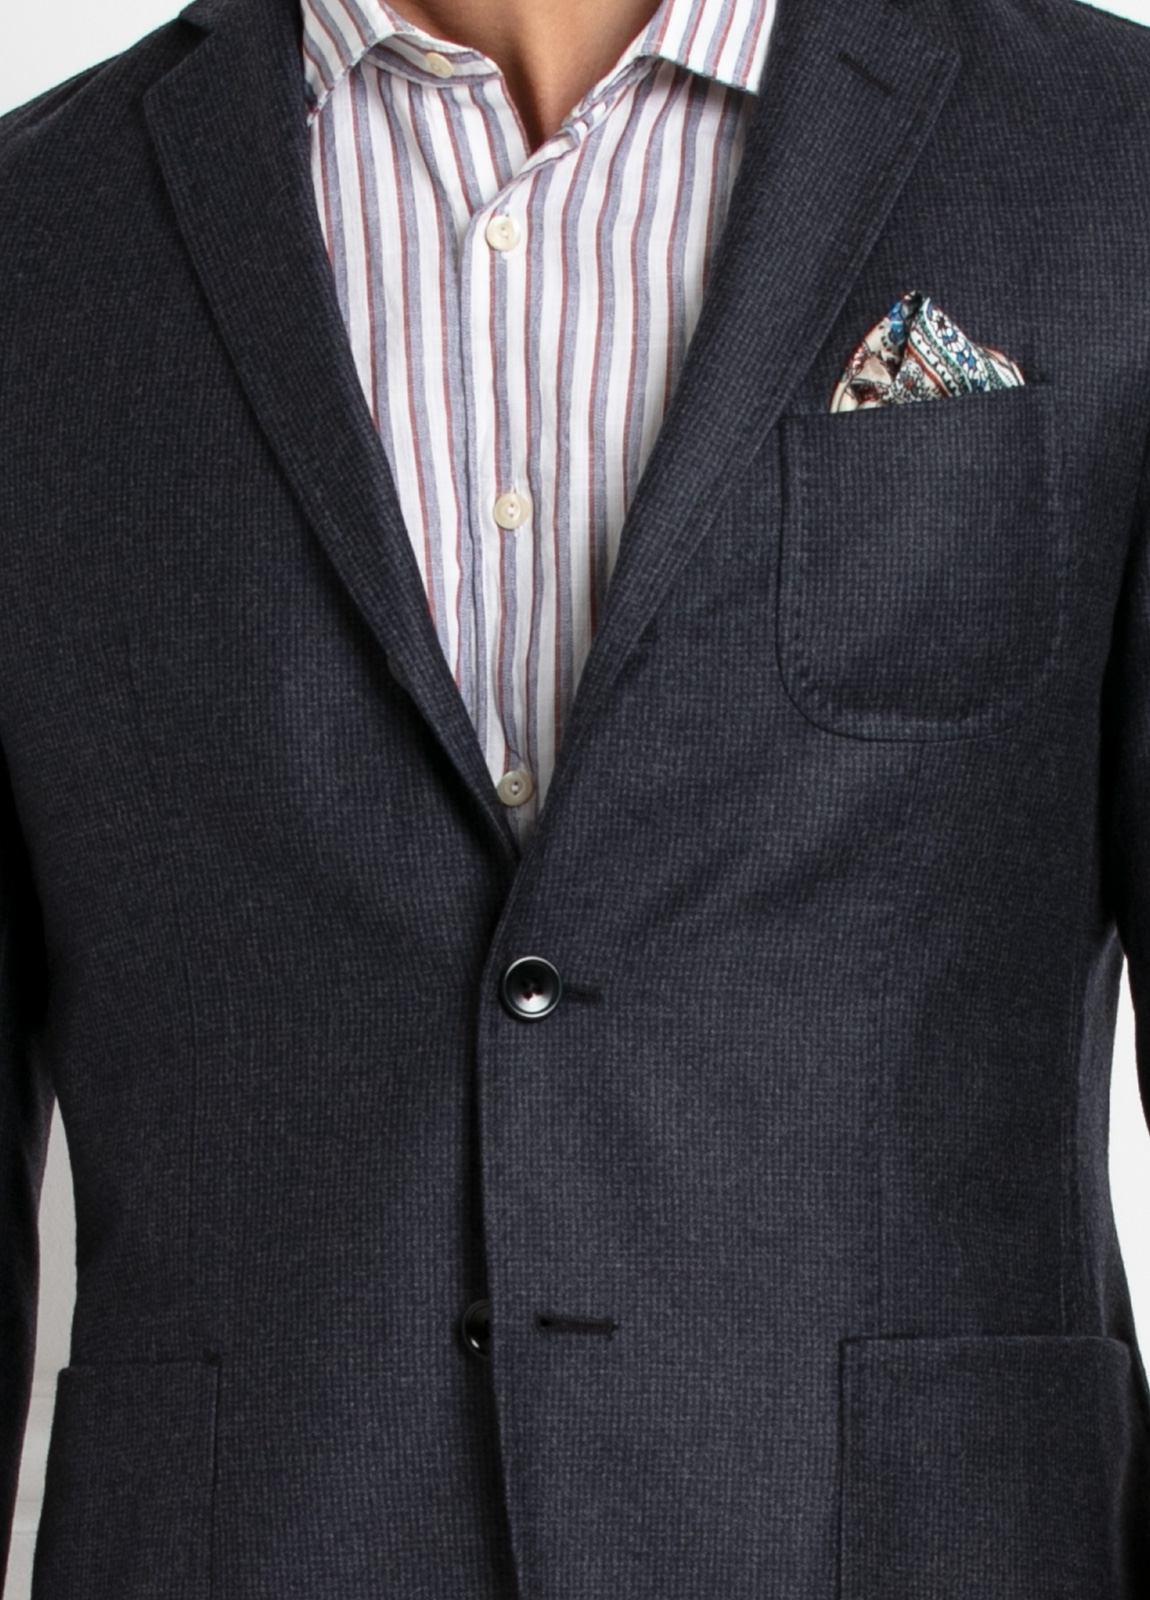 Americana SOFT JACKET Slim Fit, diseño tipo Cheviot cuadro vichy color gris. 100% Lana. - Ítem4